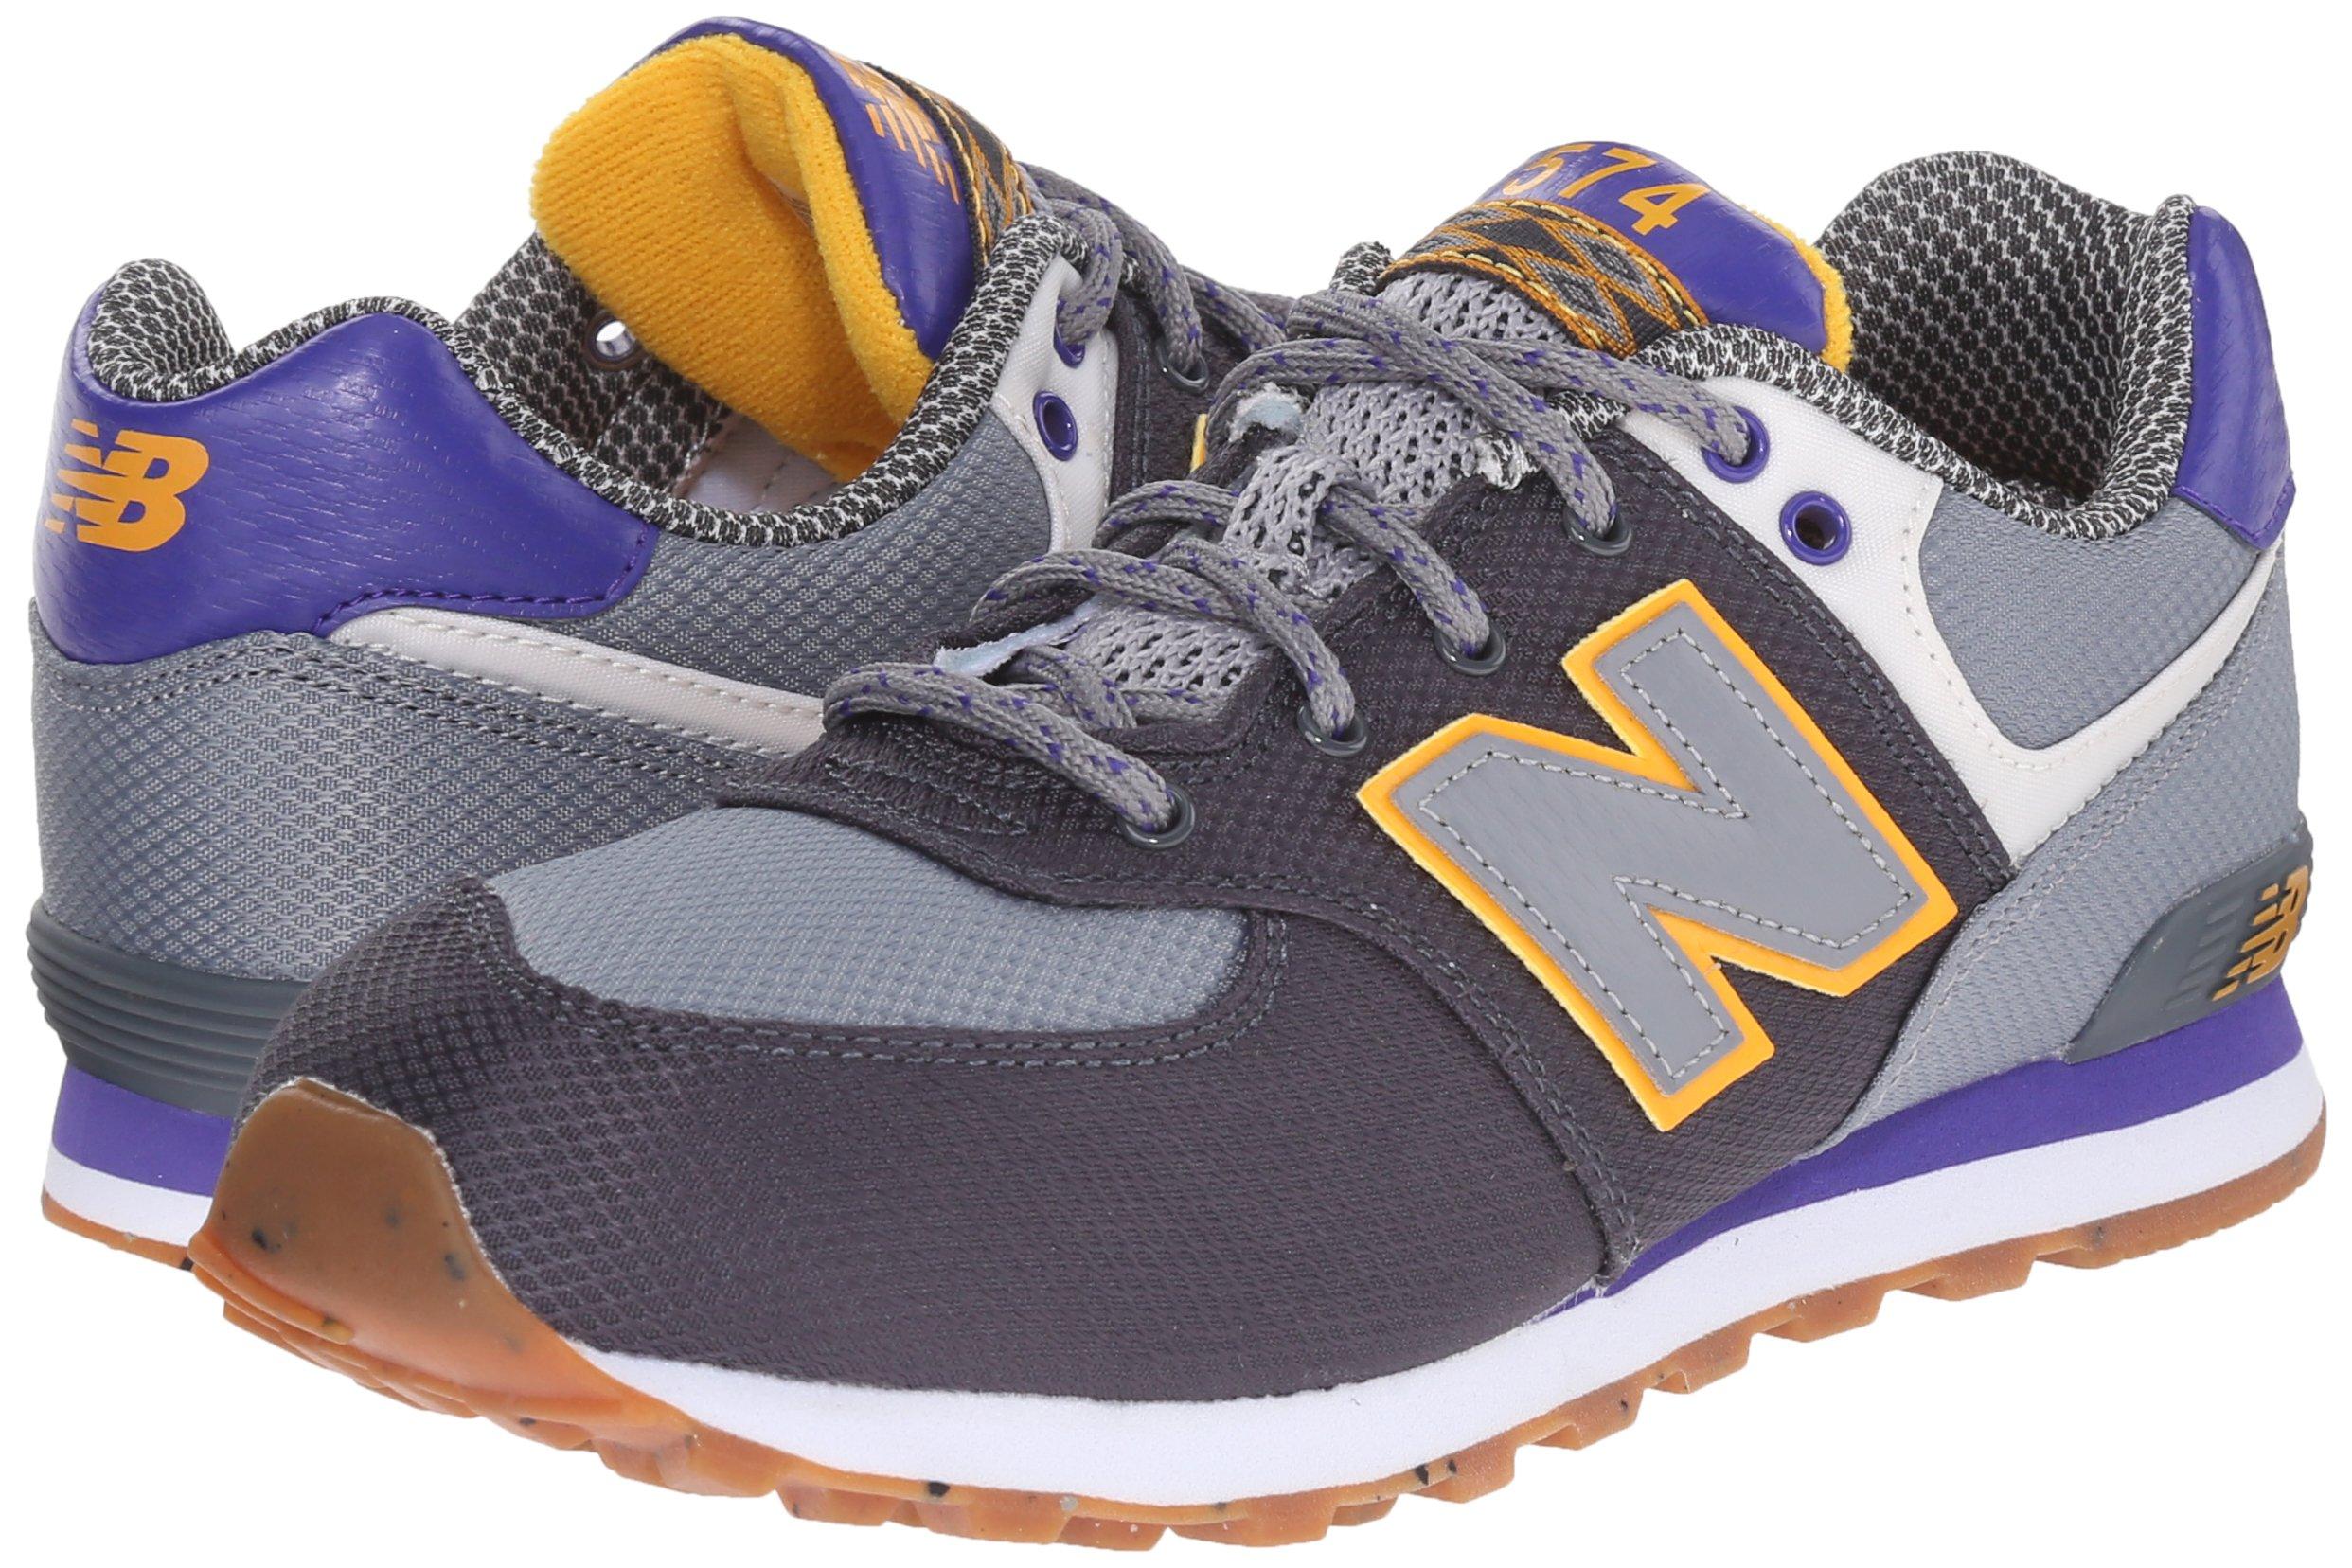 New Balance KL574E7G Schuhe grey-purple heather - 35,5